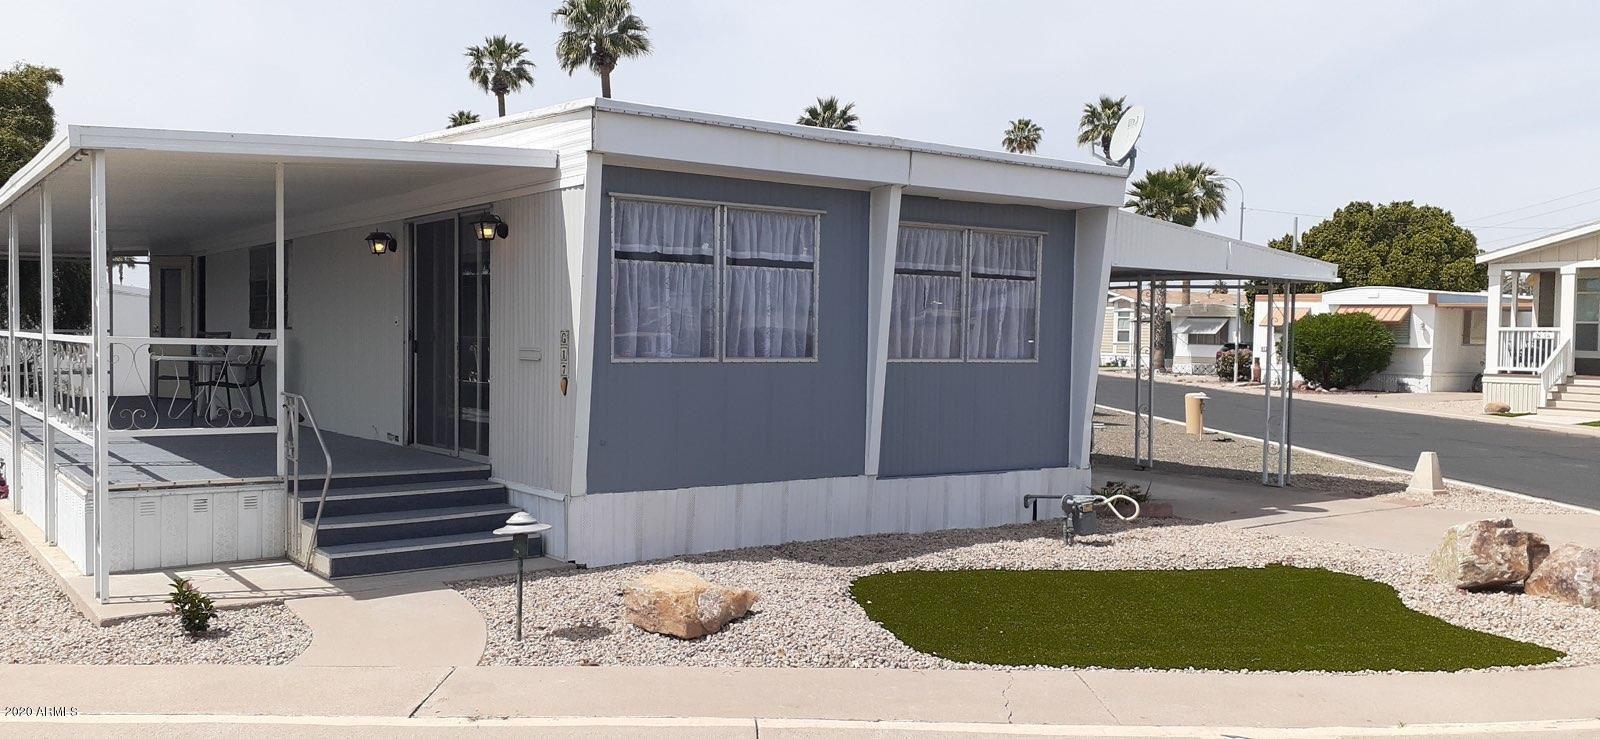 2460 E MAIN Street #G17, Mesa, AZ 85213 - #: 6060579